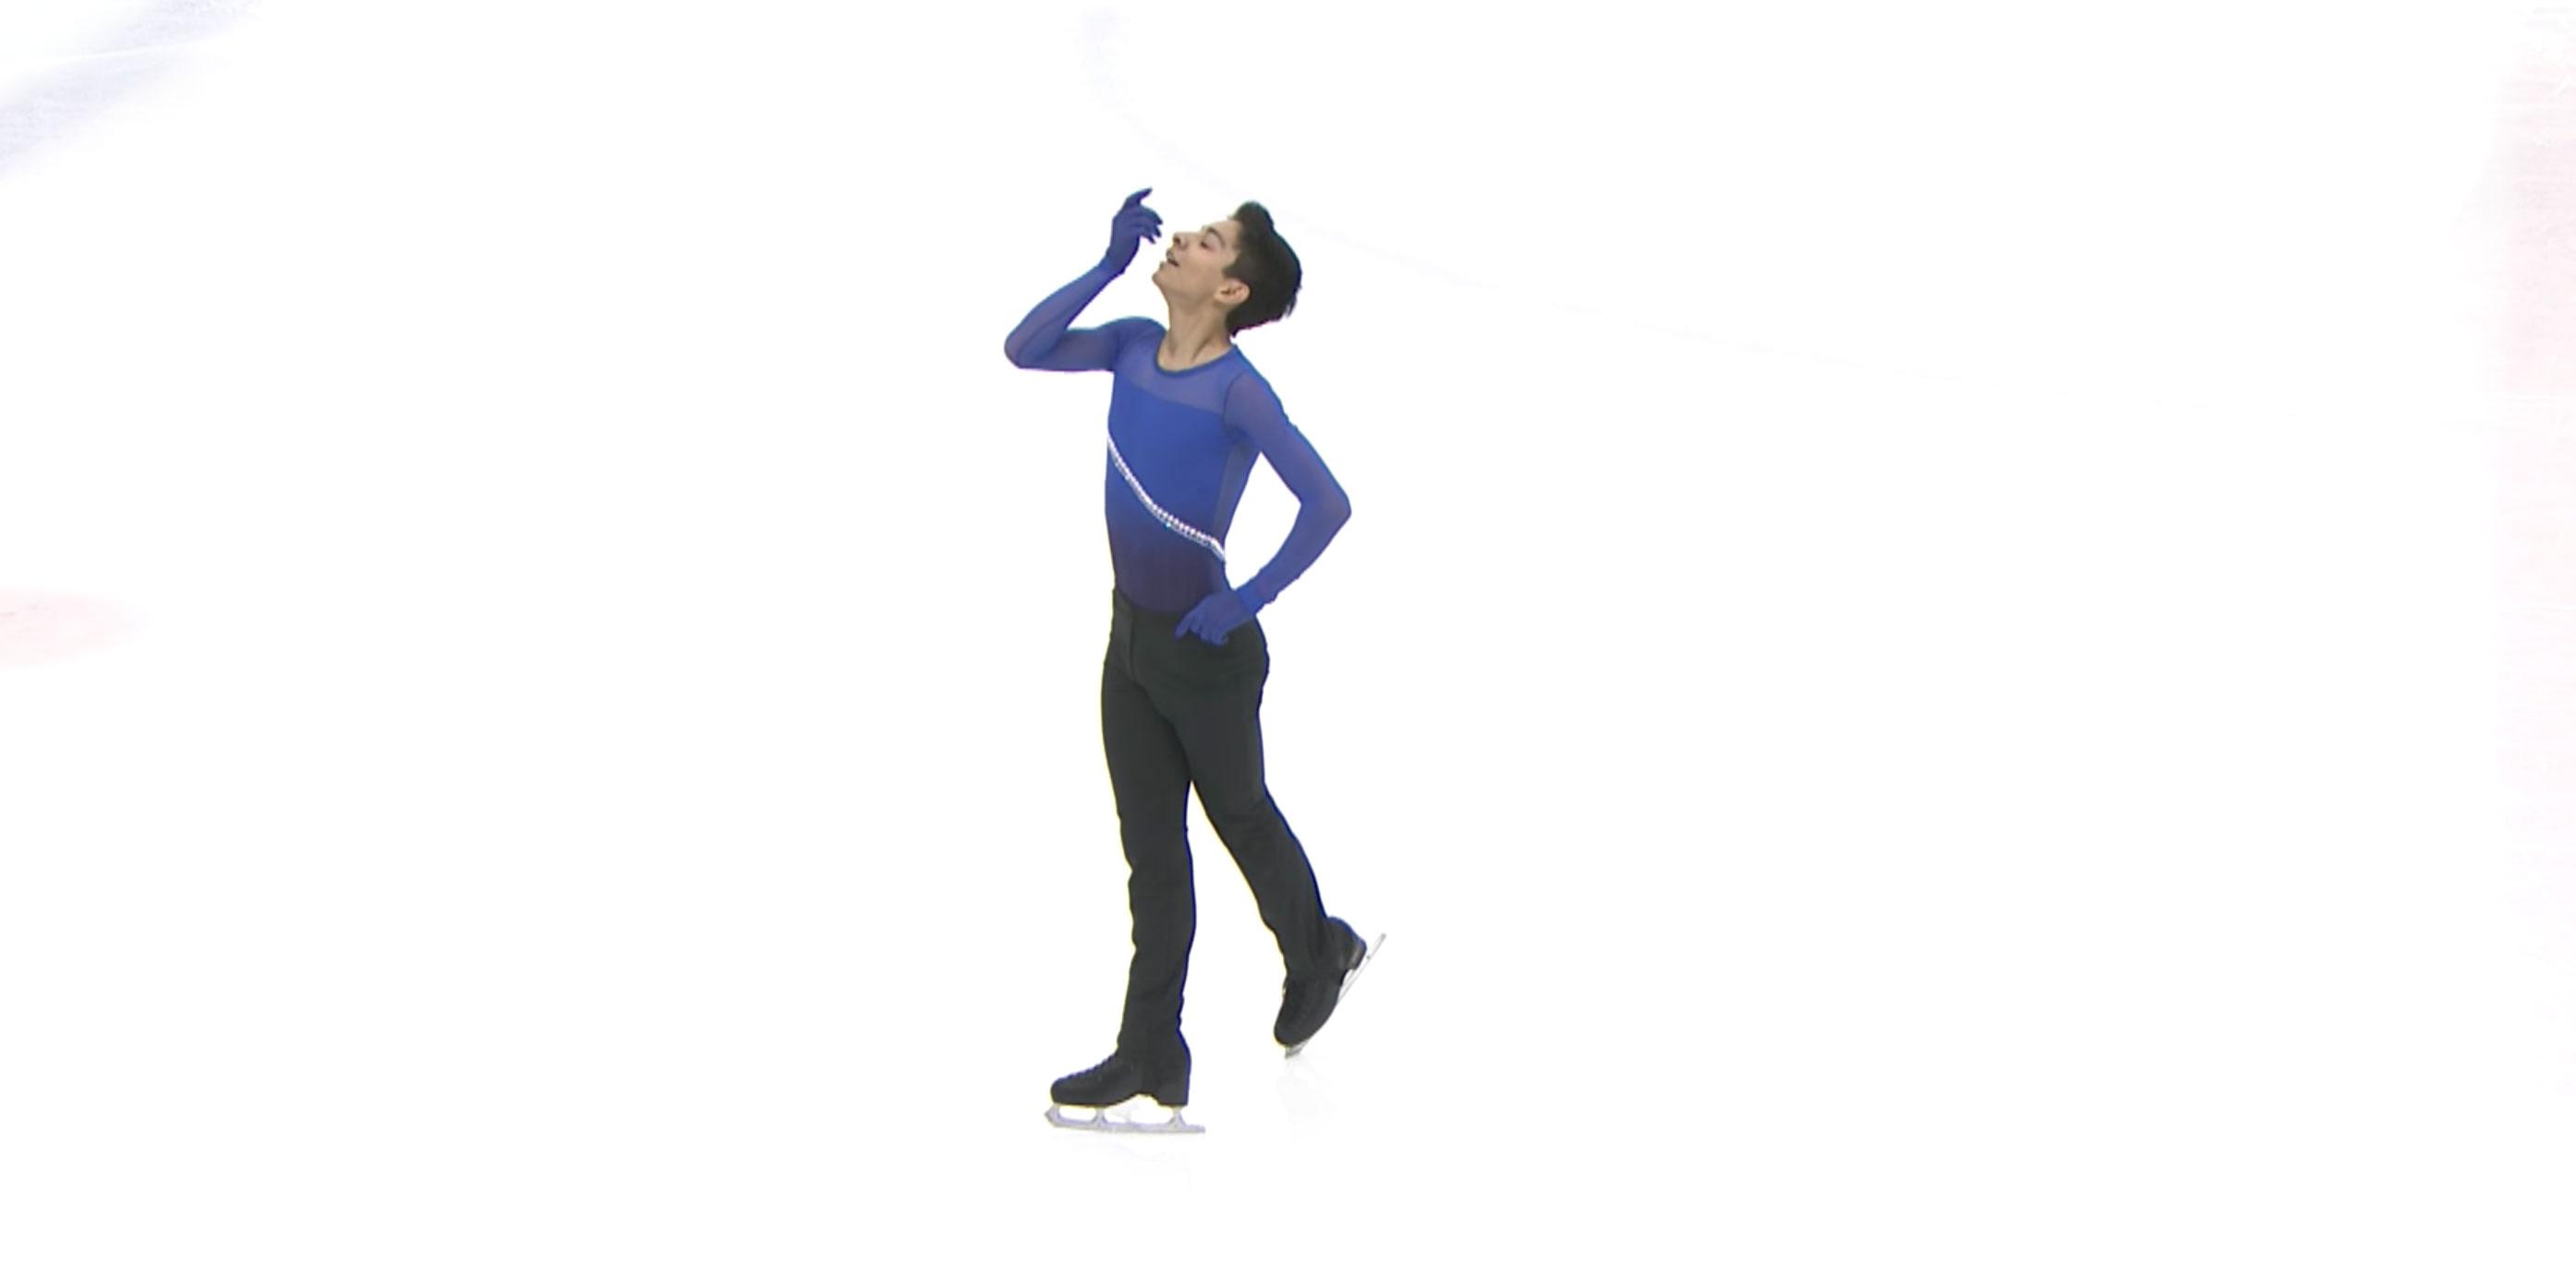 juanga-ice-skating_sports